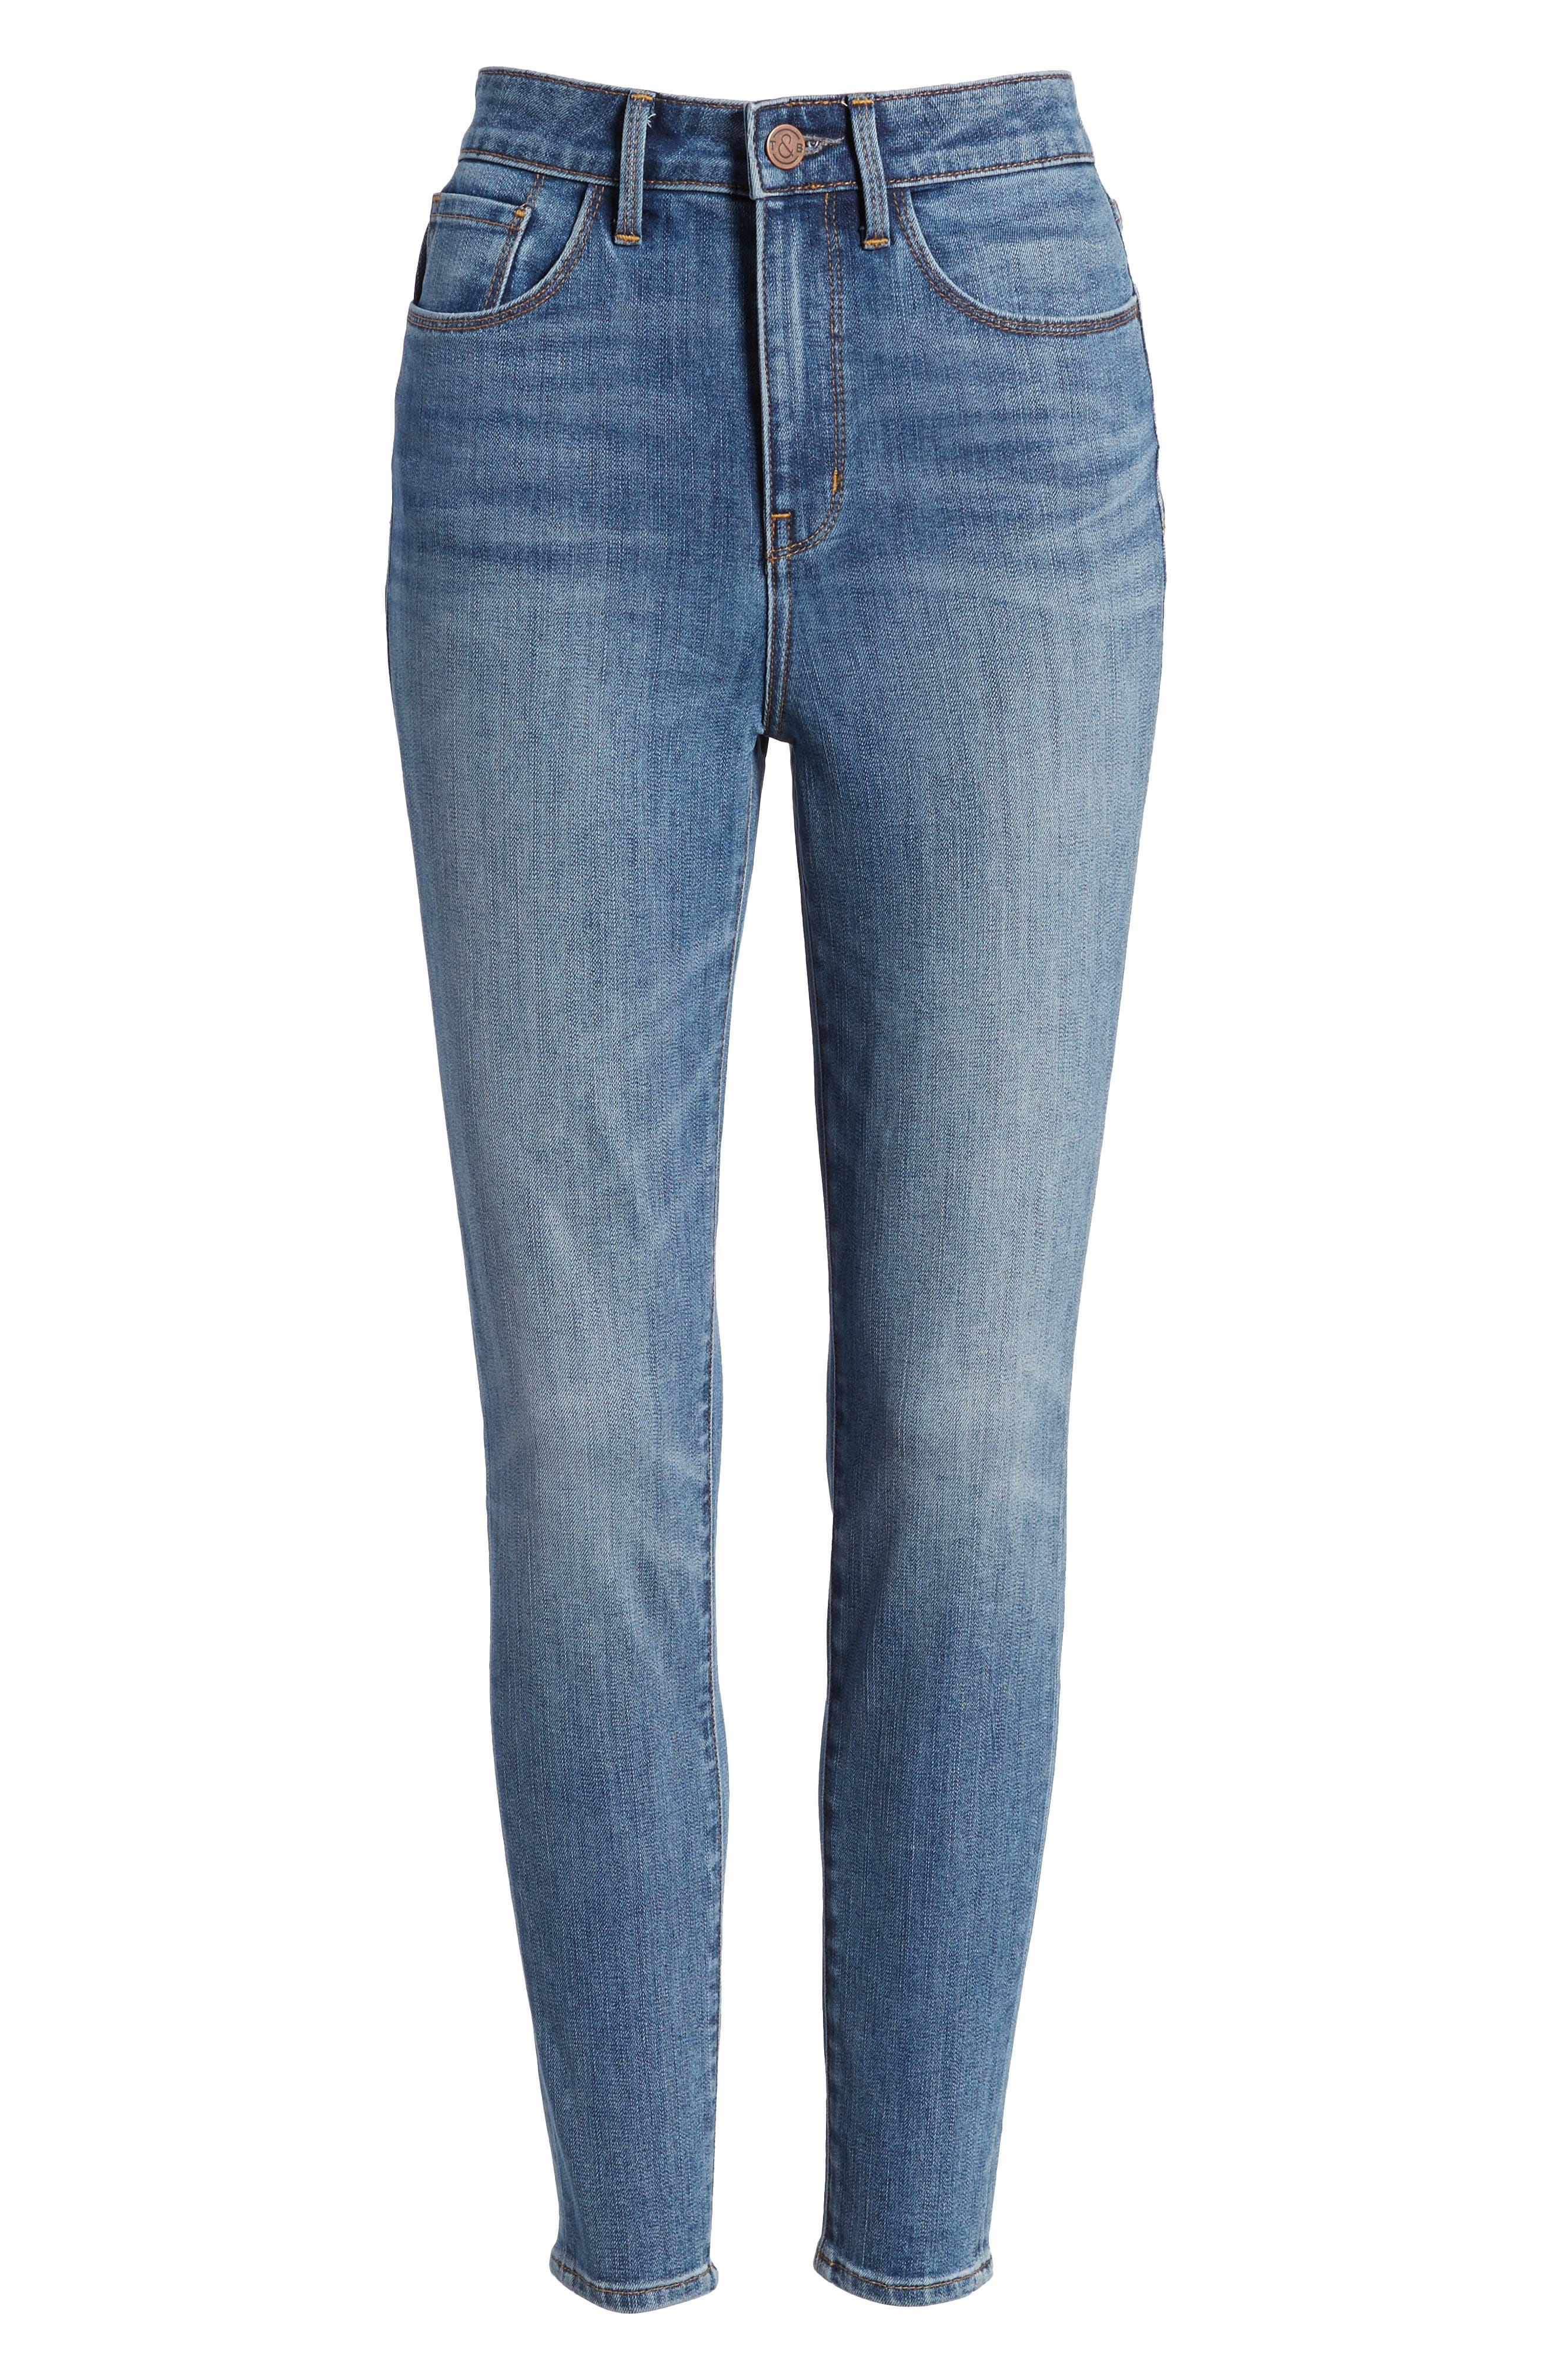 Charity High Waist Skinny Ankle Jeans,                             Alternate thumbnail 8, color,                             Rain Dusk Worn